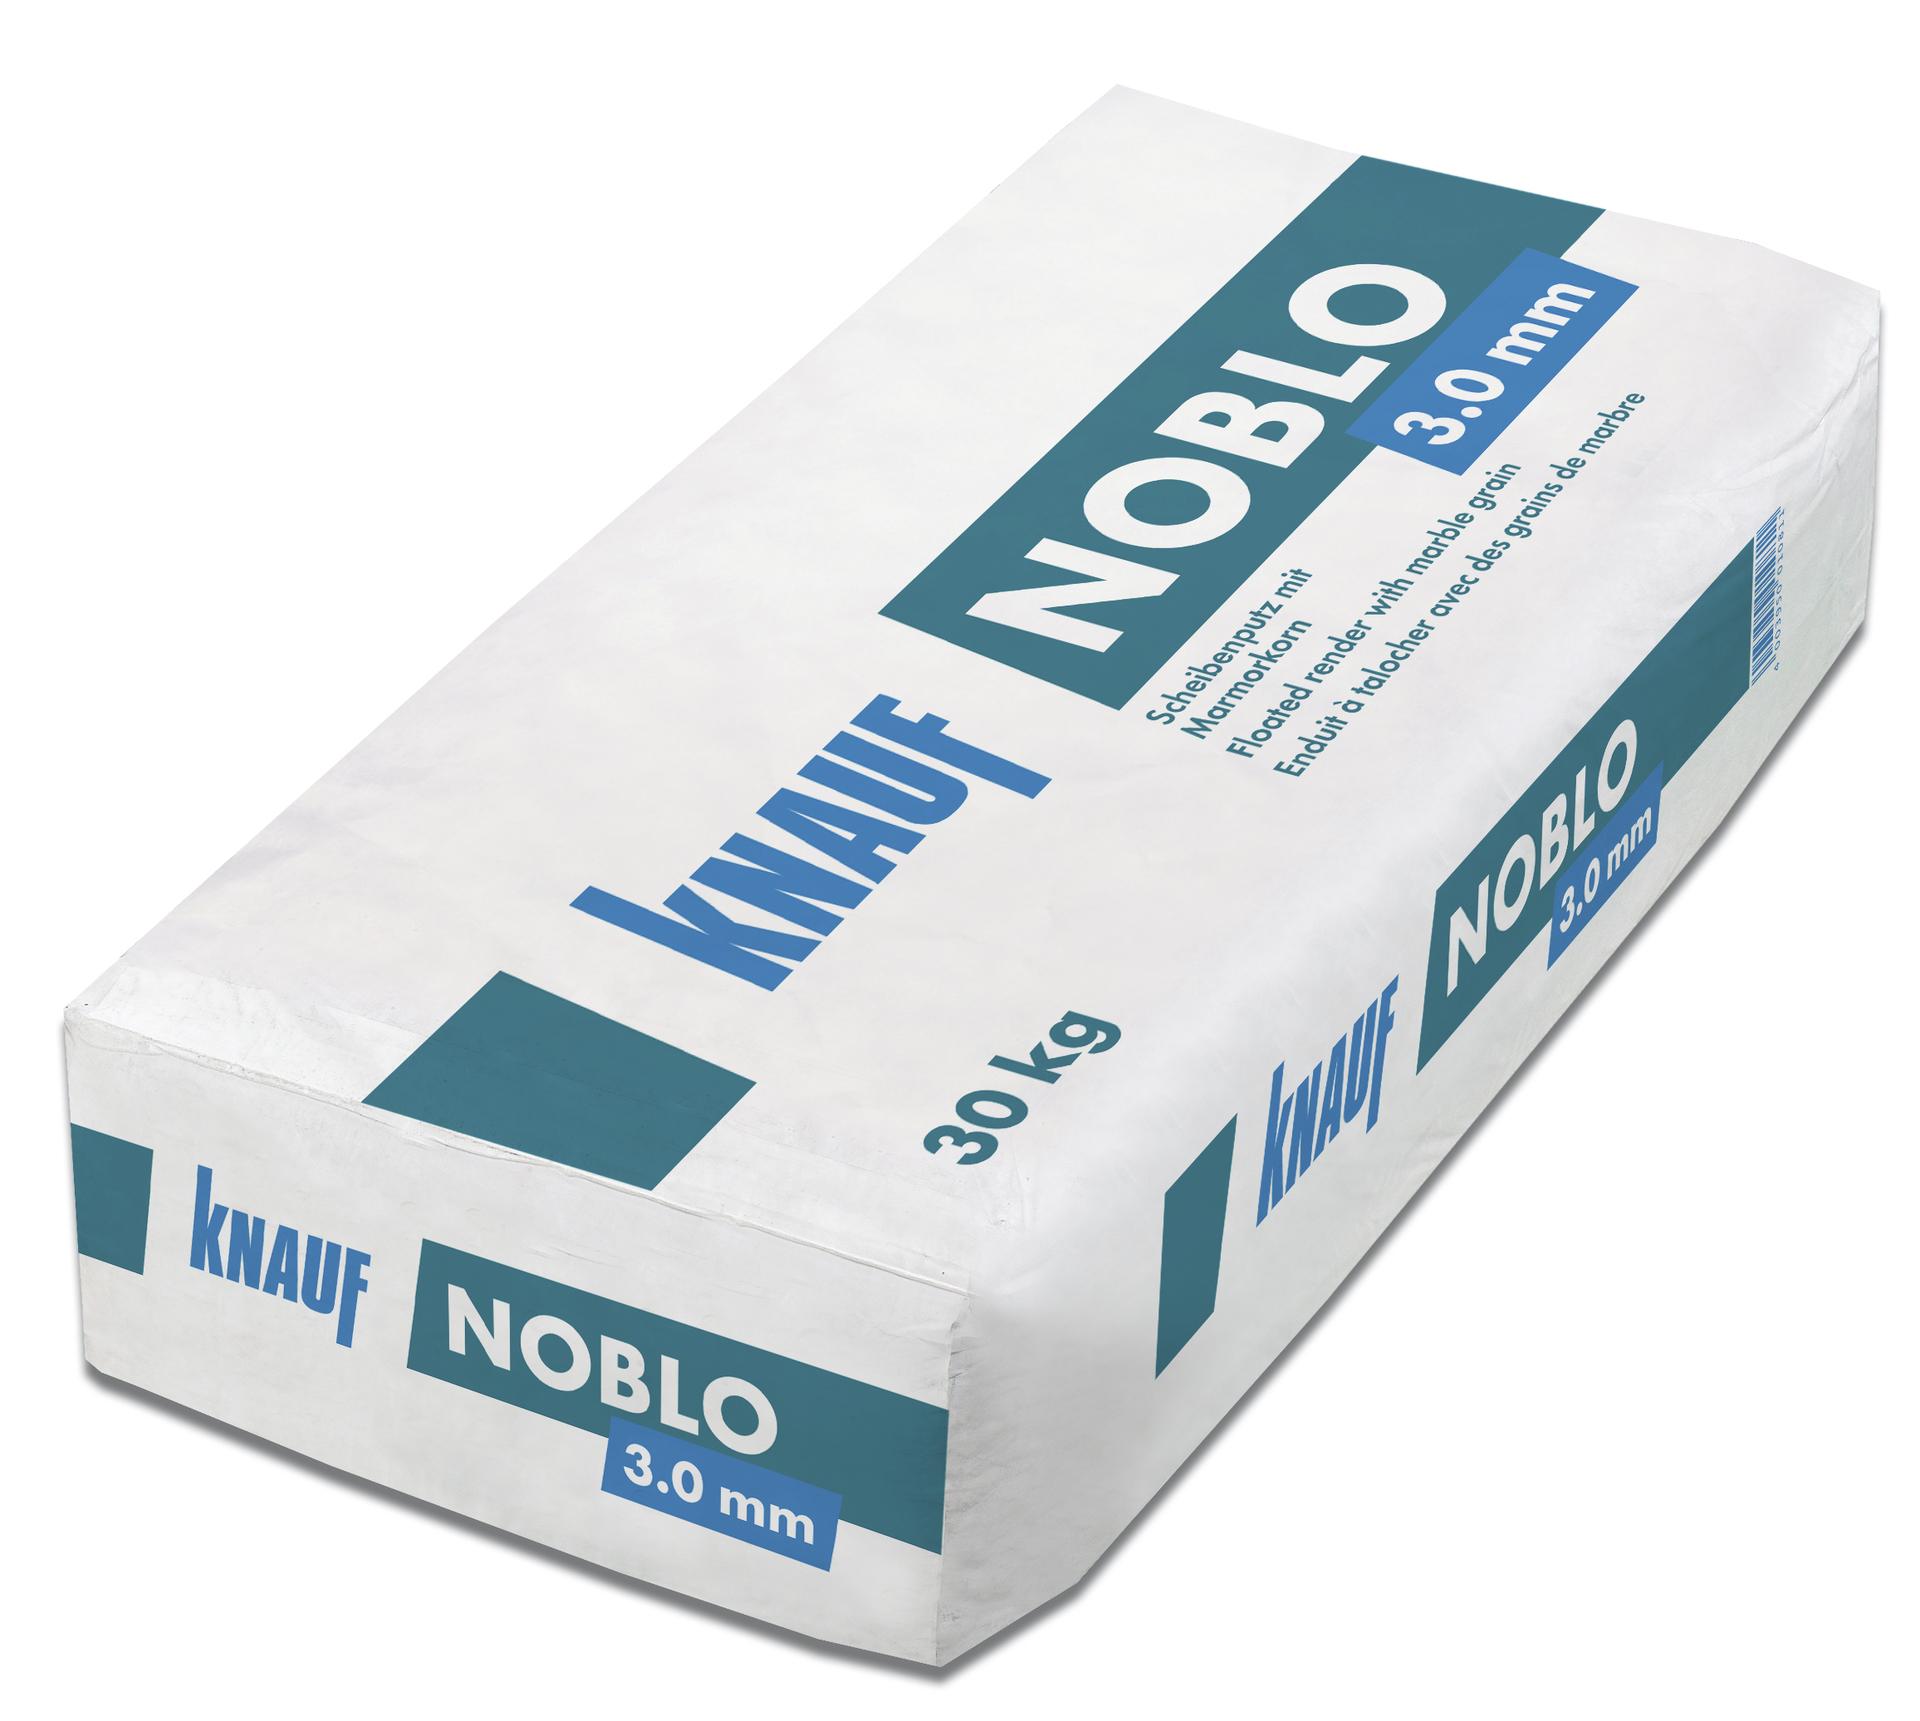 noblo filzputz mit marmorkorn 30 kg / sack - 1mm korn | www.kemmler.de